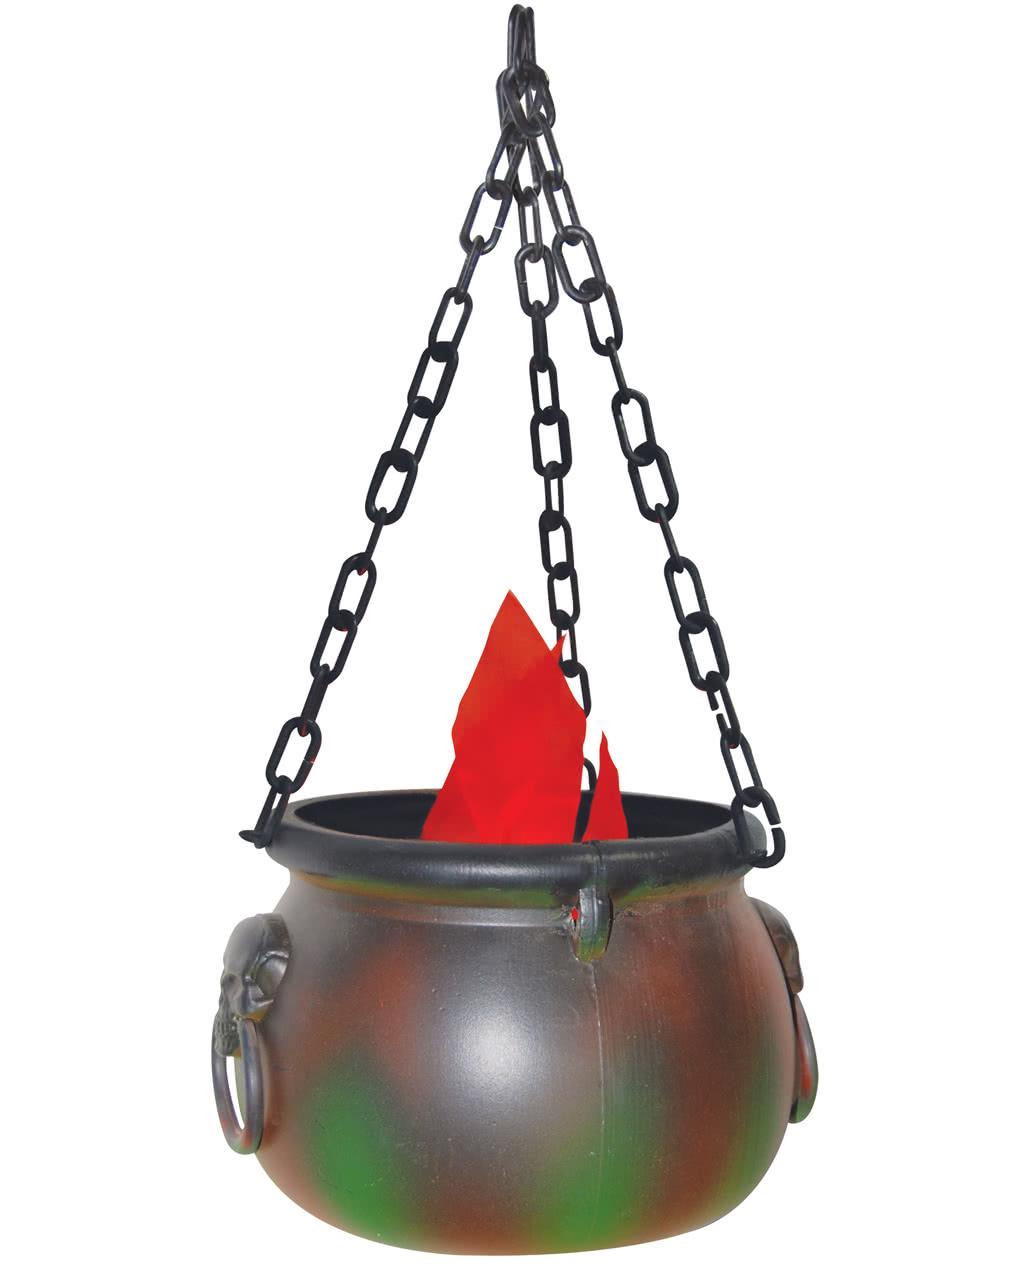 cauldron with flames led light halloween decoration horror. Black Bedroom Furniture Sets. Home Design Ideas